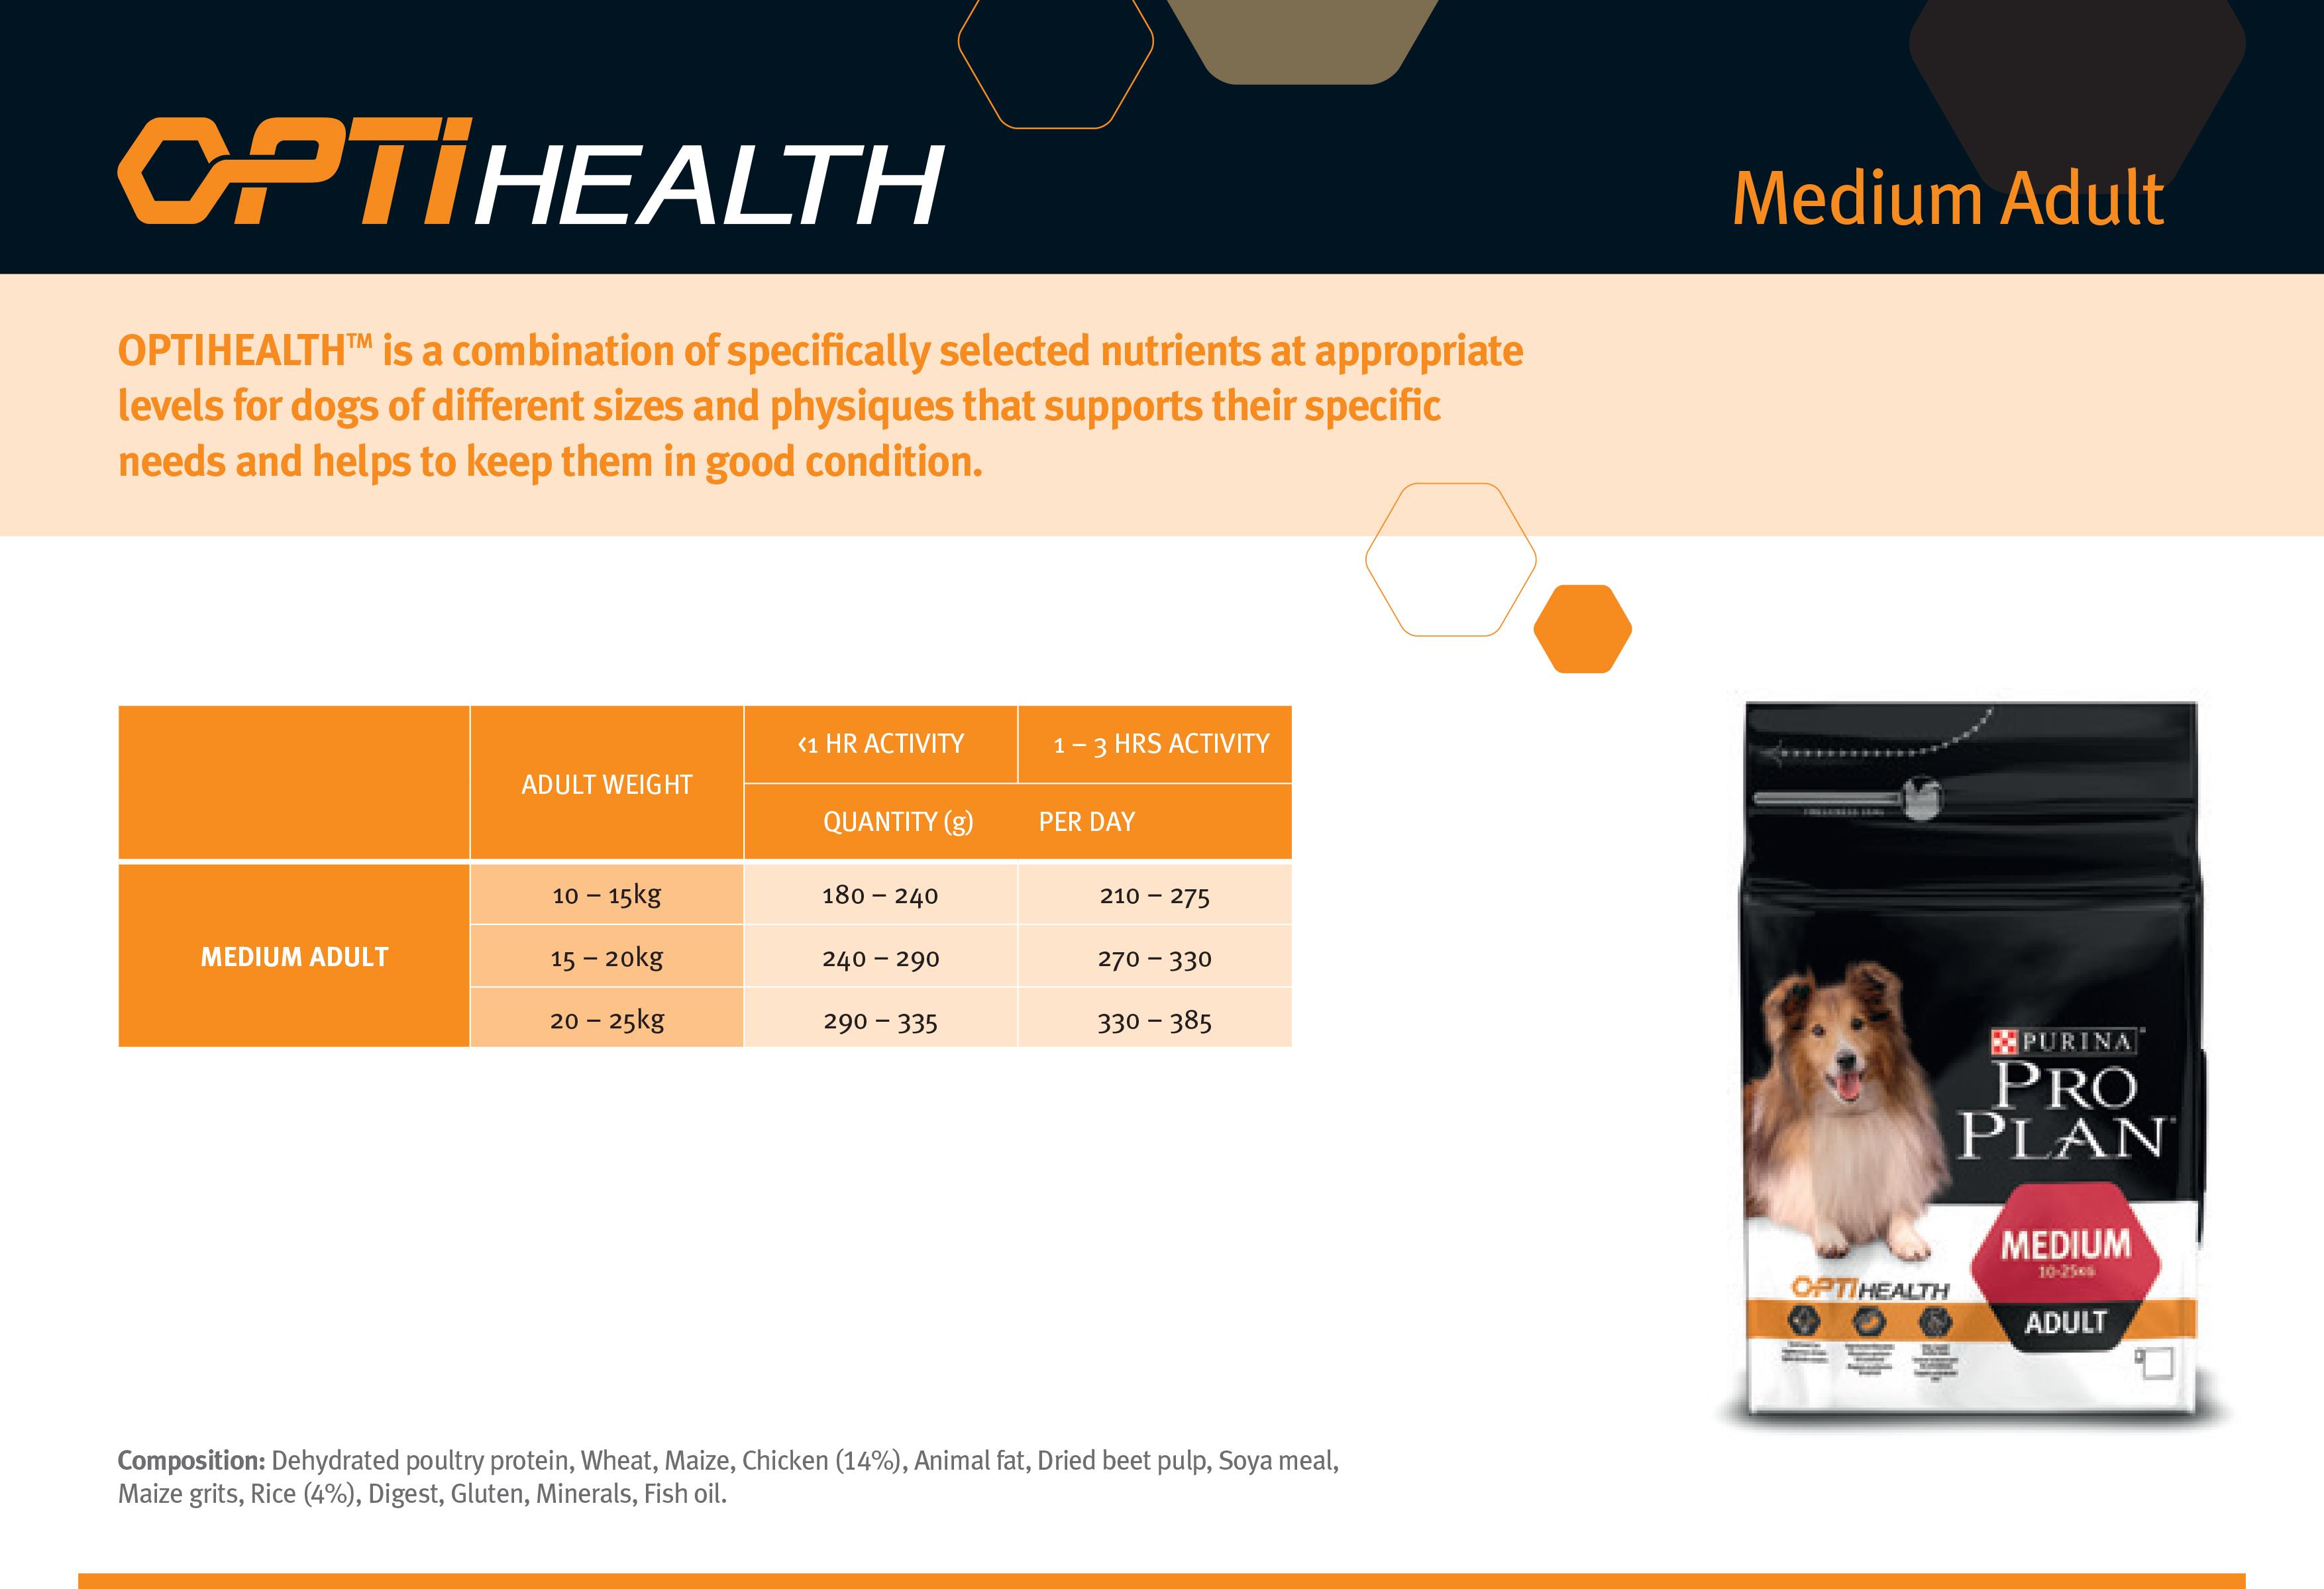 purina pro plan medium adult dog chicken. Black Bedroom Furniture Sets. Home Design Ideas